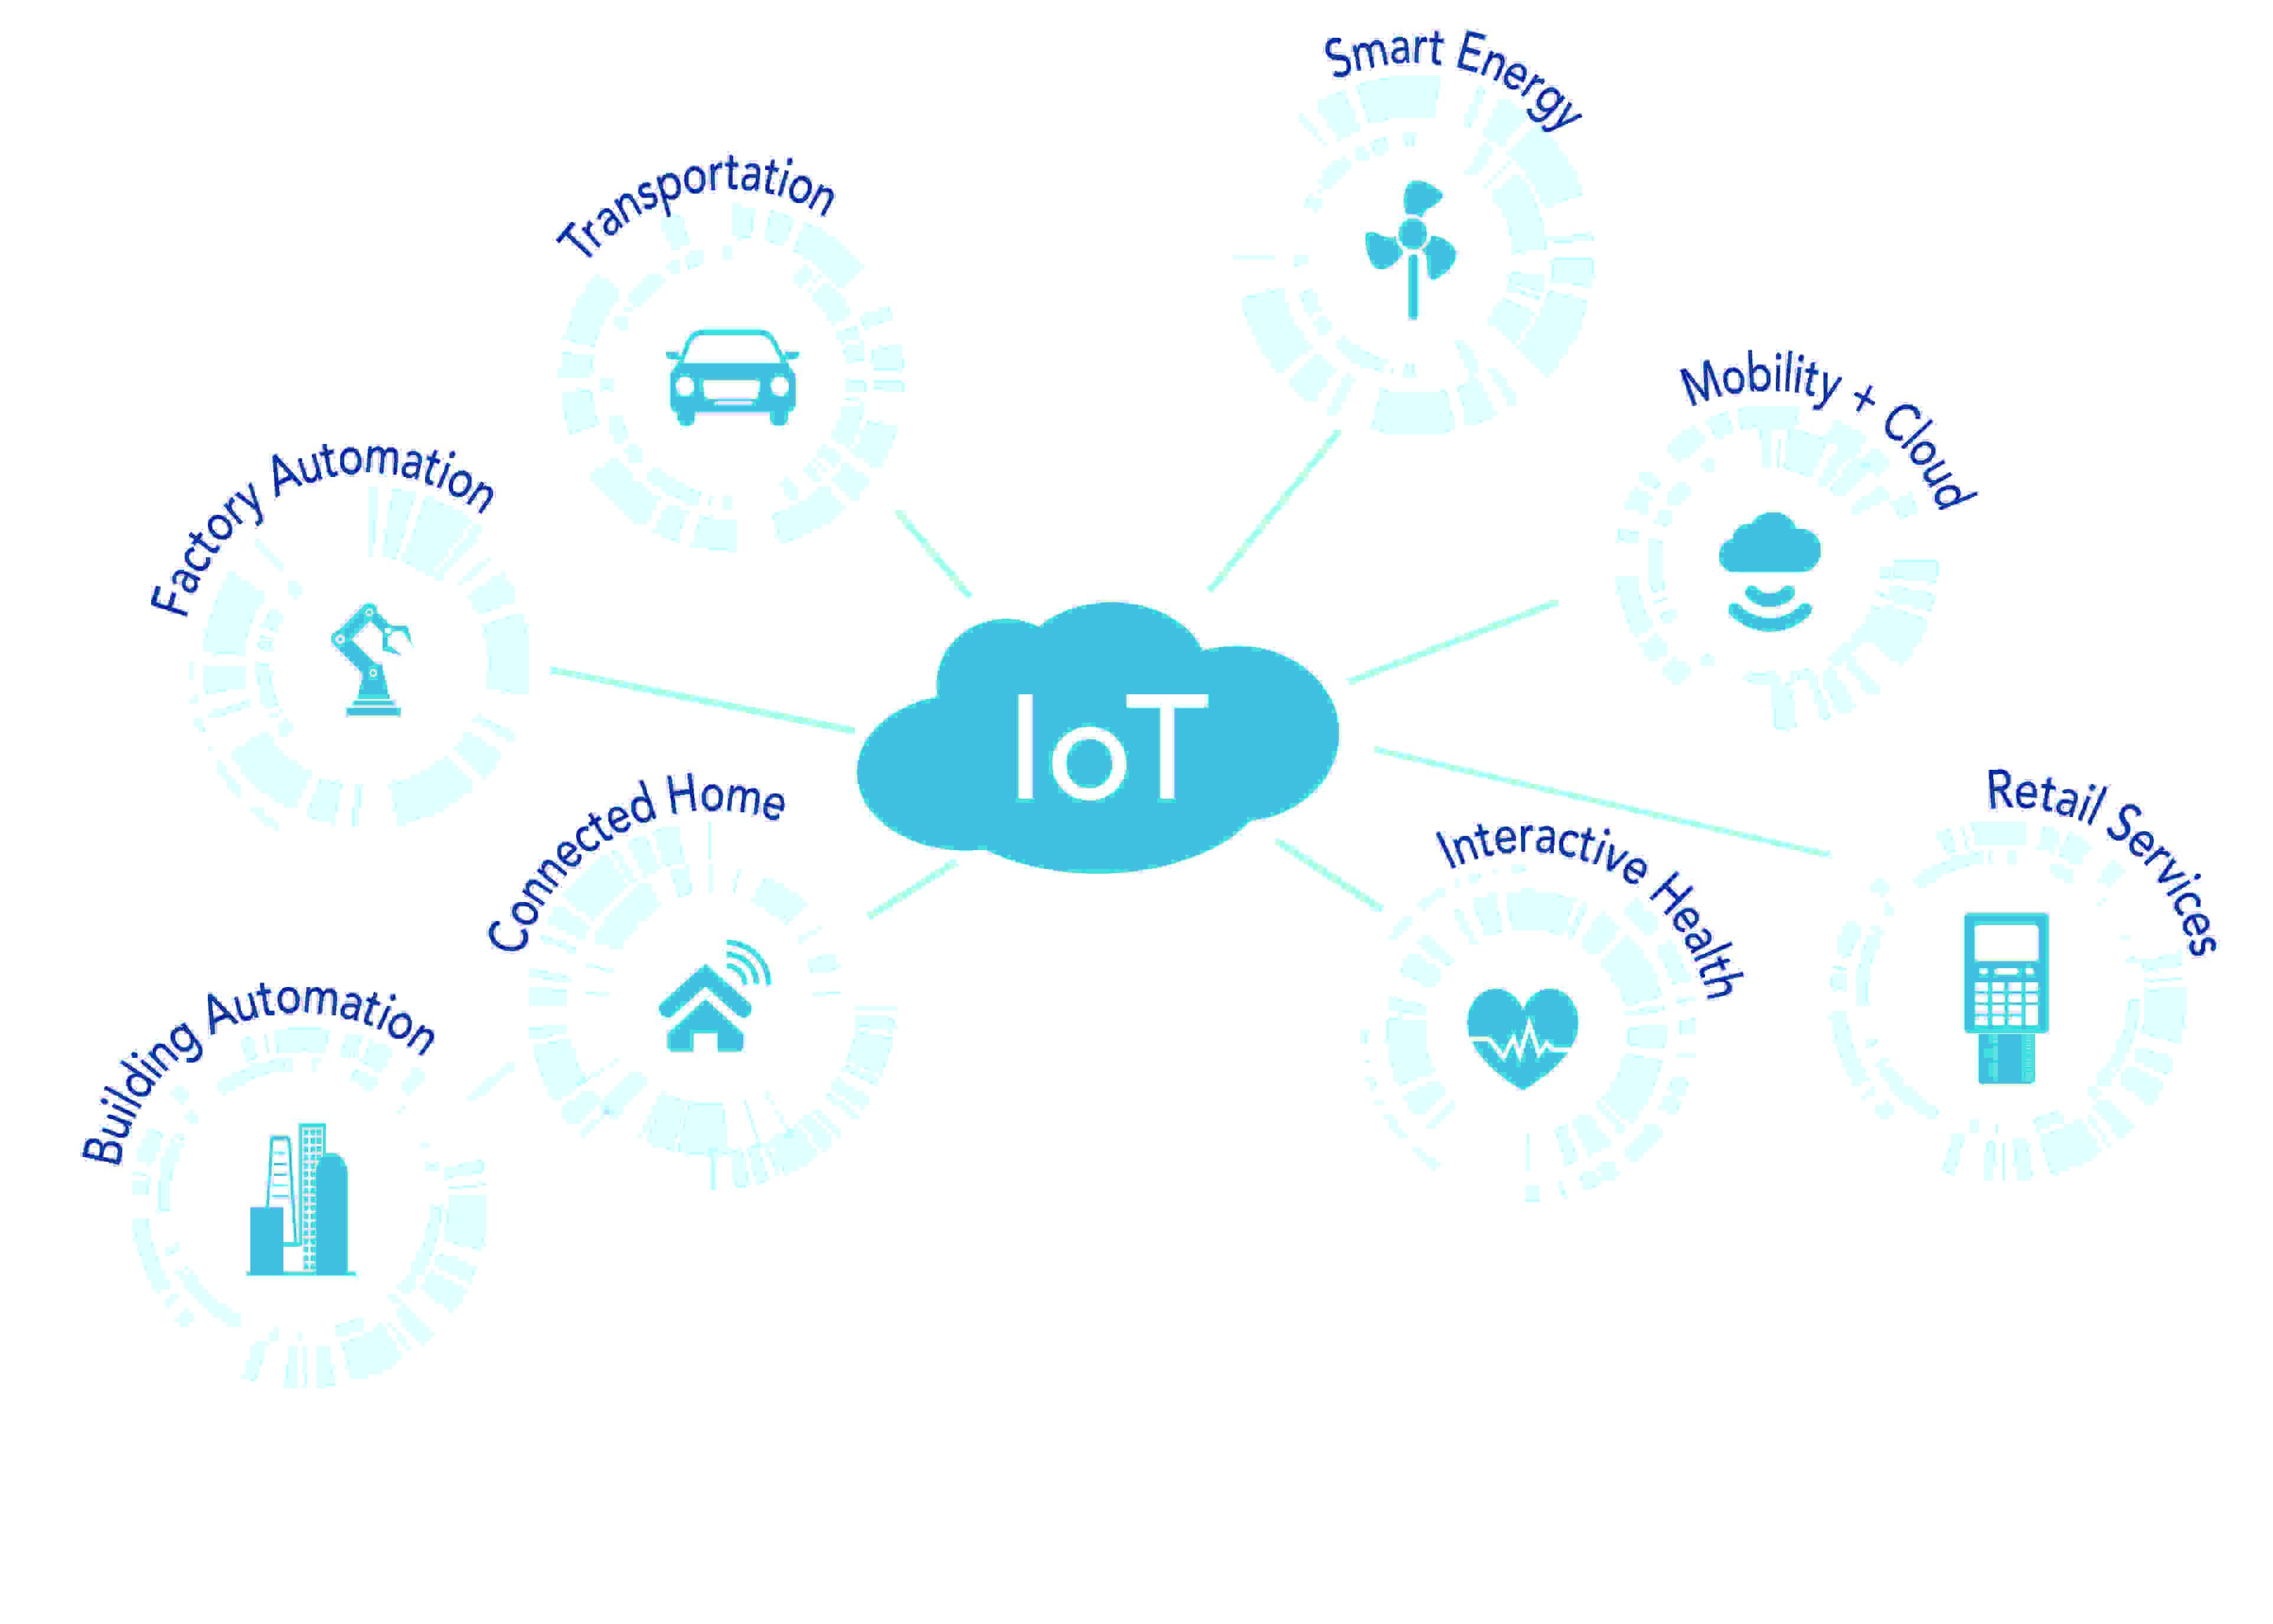 IoT Connectivity Creates New Capabilities For Smart Cities